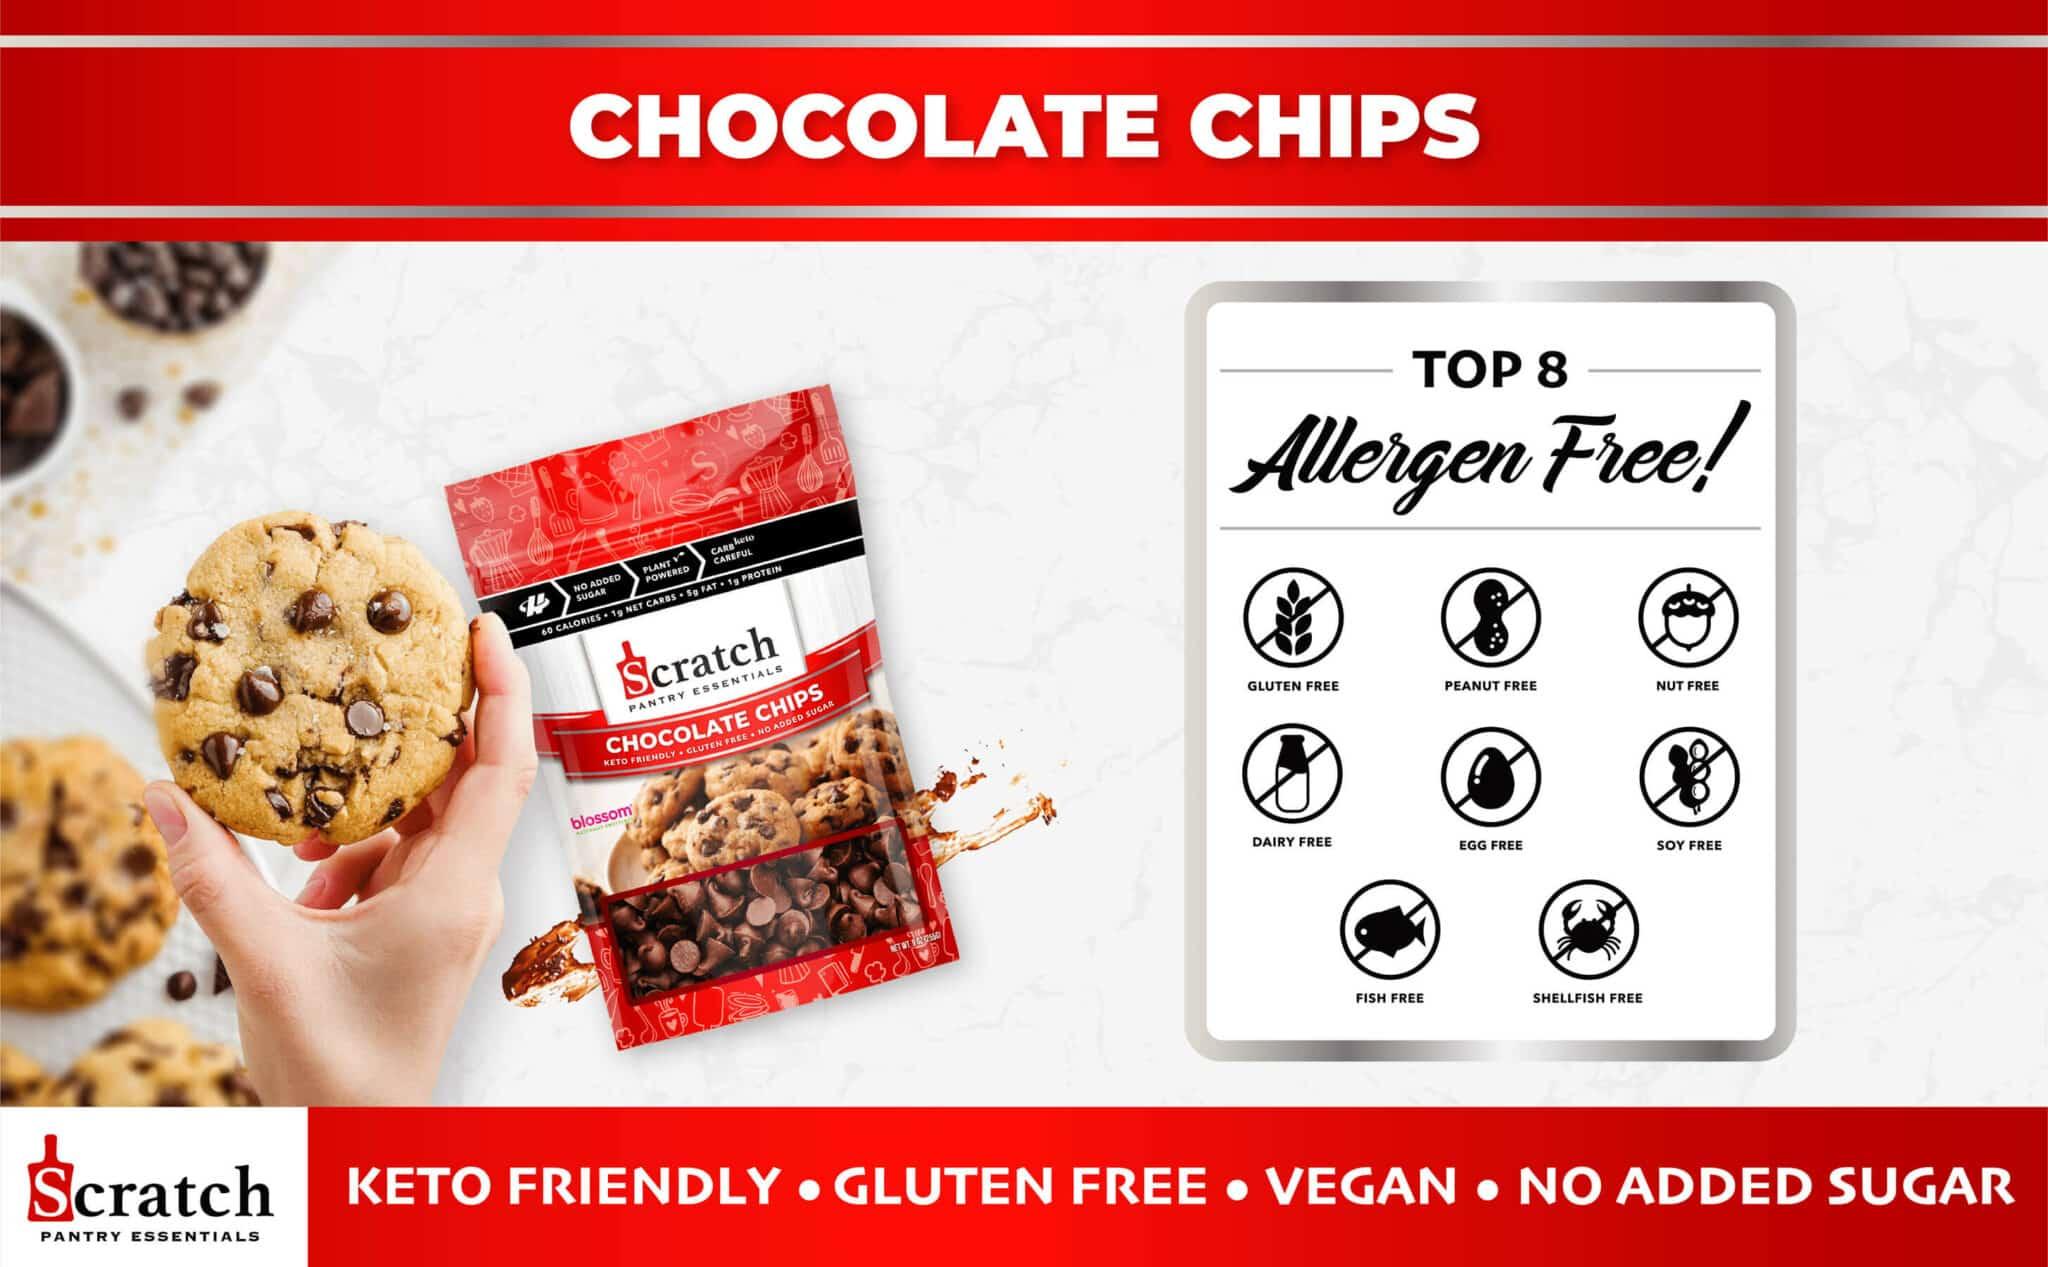 Keto, Sugar Free Chocolate Chips